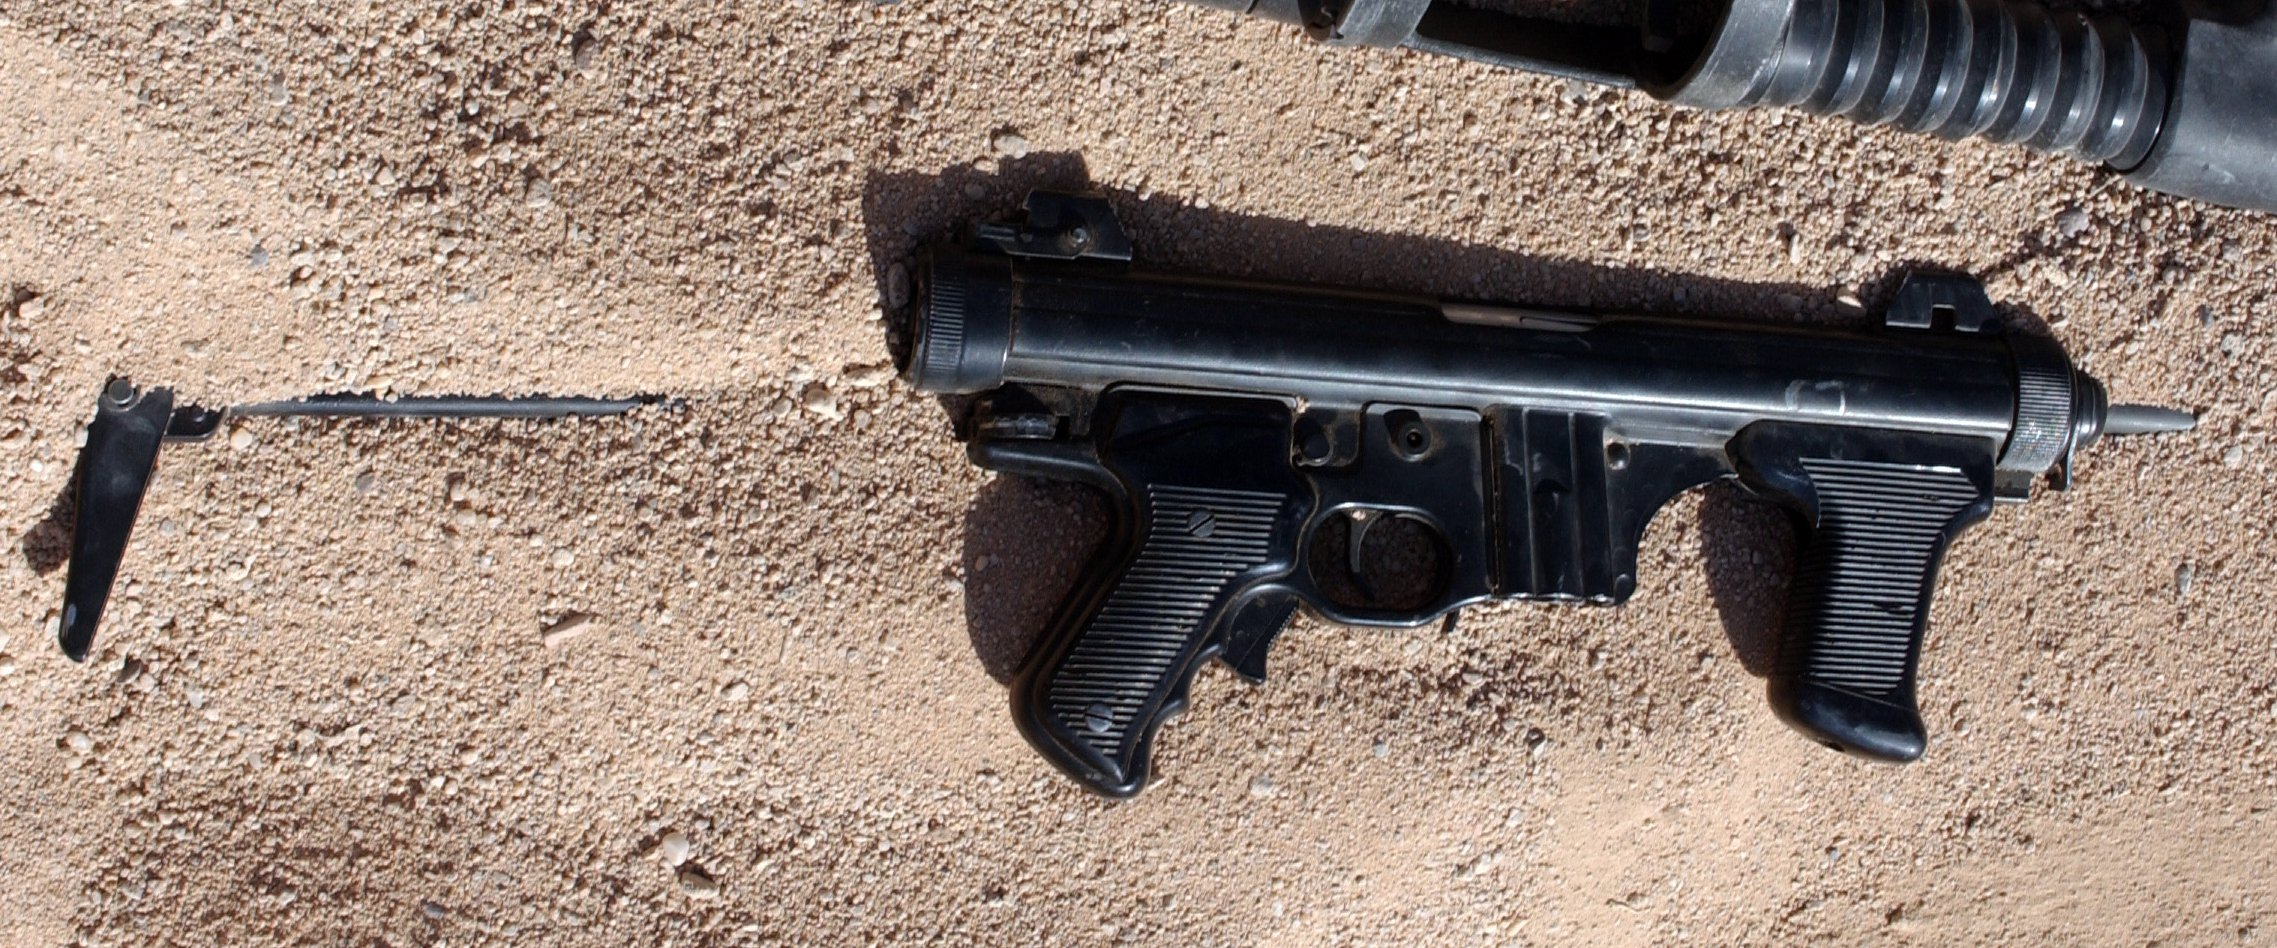 gun review beretta model 12s the truth about guns. Black Bedroom Furniture Sets. Home Design Ideas